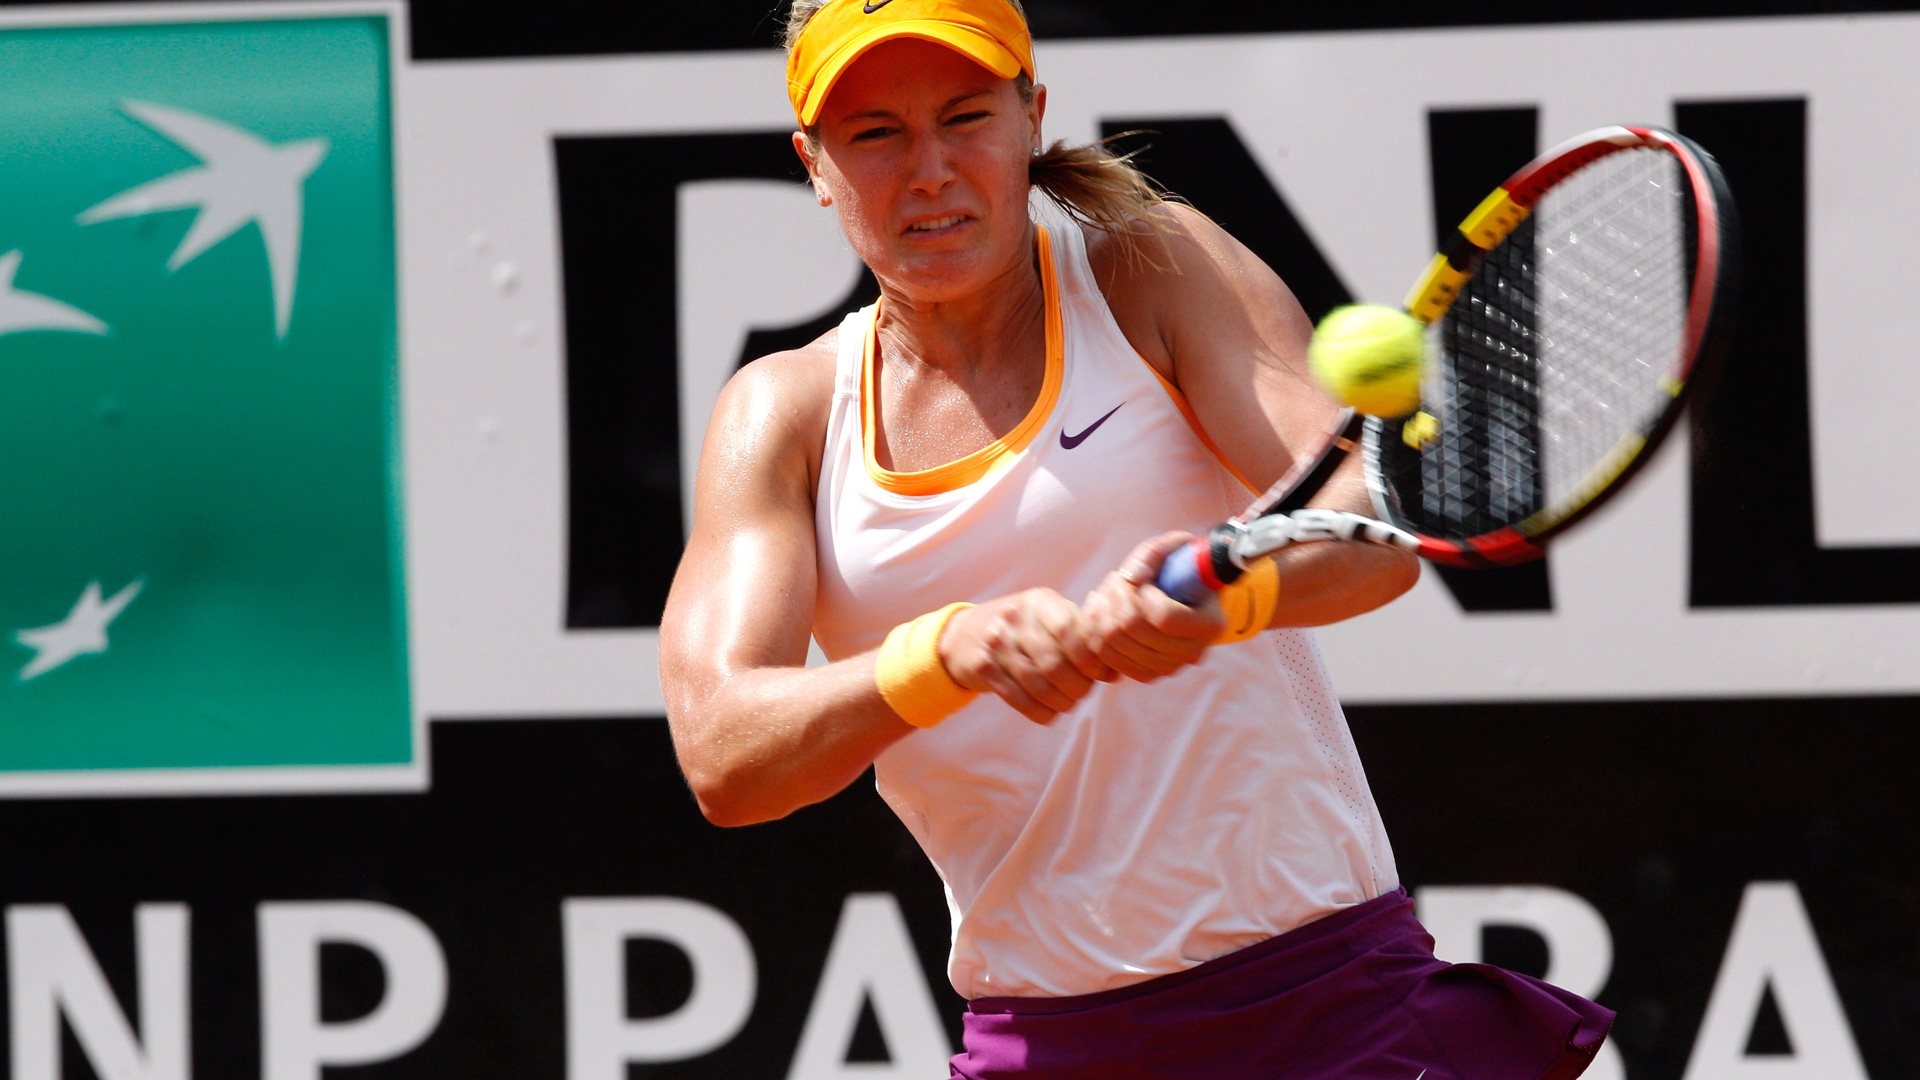 eugenie-bouchard-rome-open-tennis-051414-ap-ftr